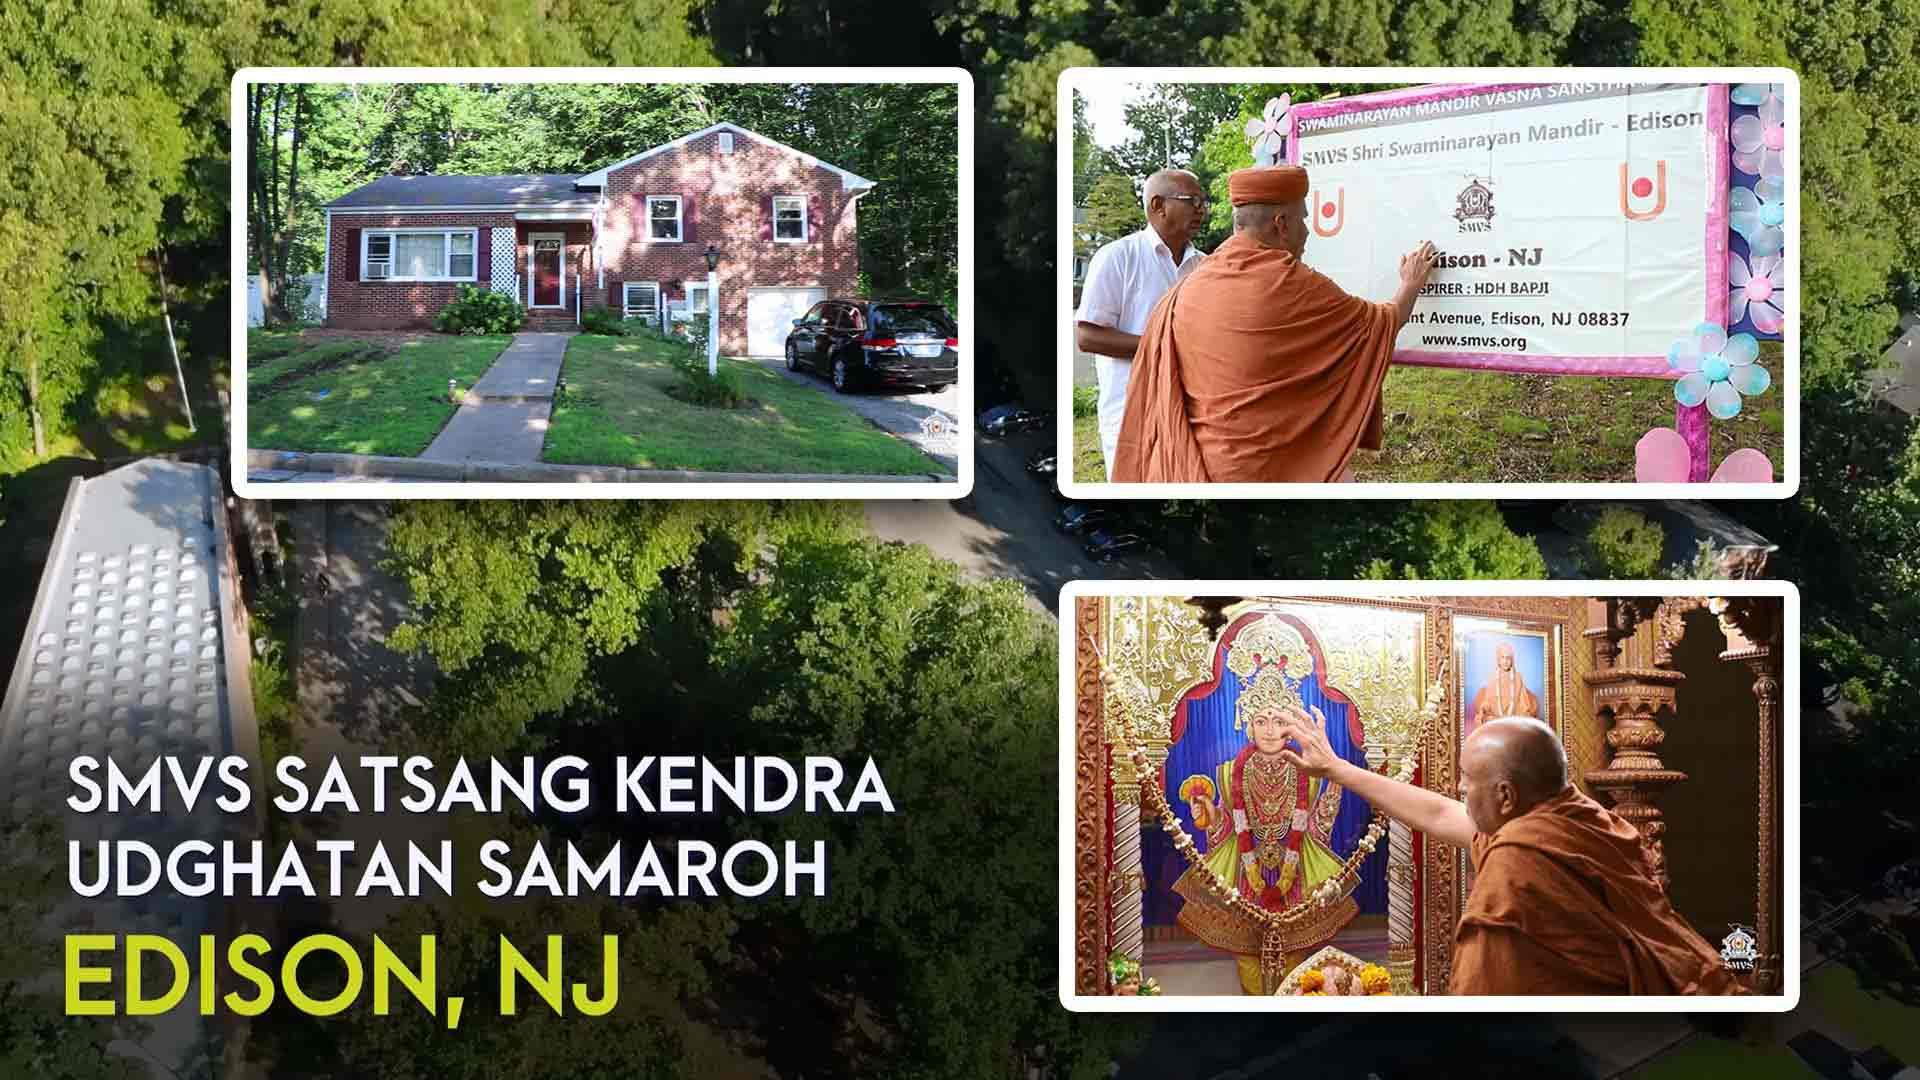 Satsang Kendra Udghatan Samaroh - Edison, NJ